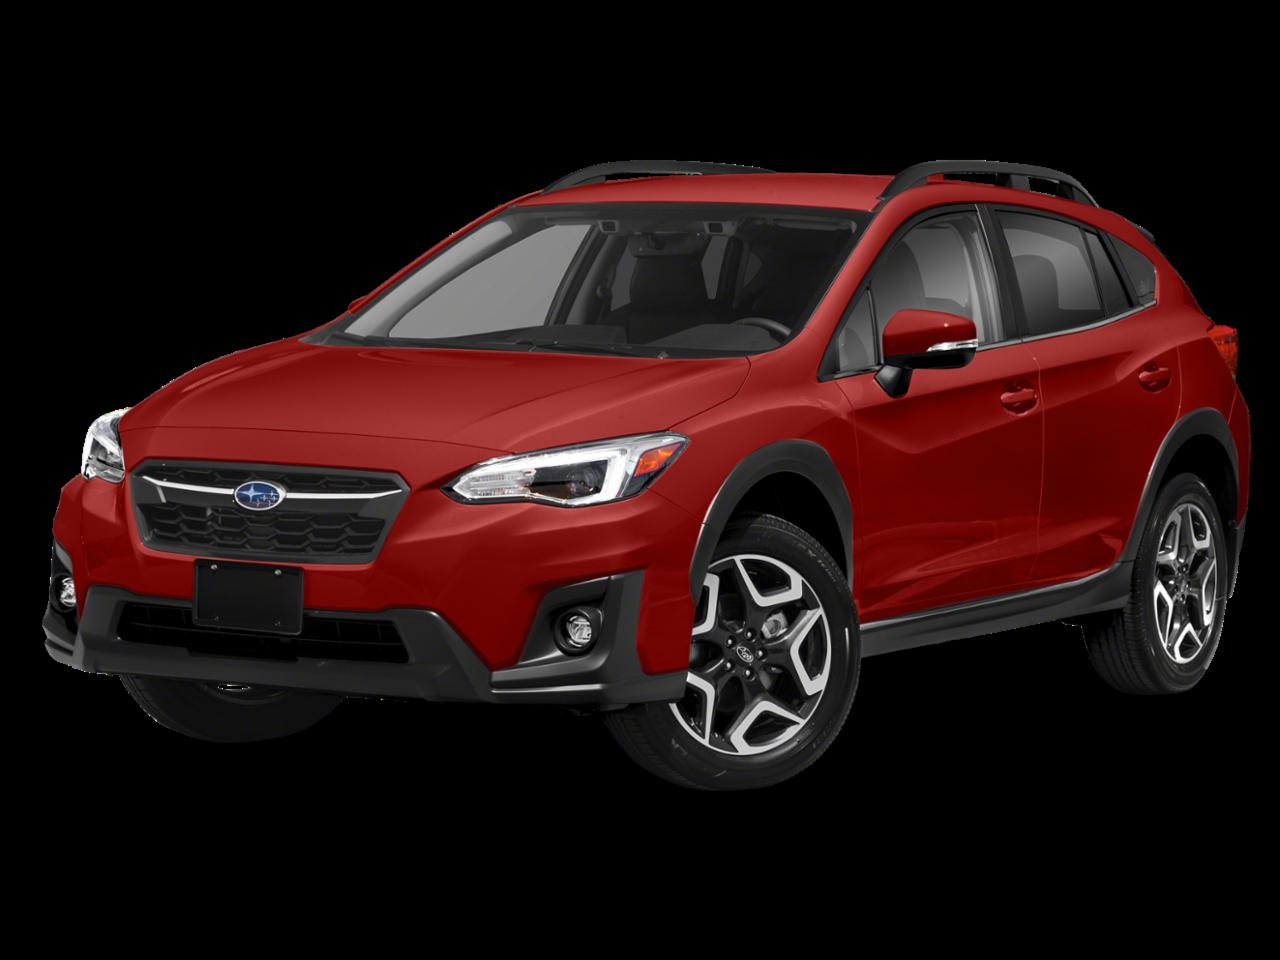 New 2020 Subaru Crosstrek 2.0i Limited